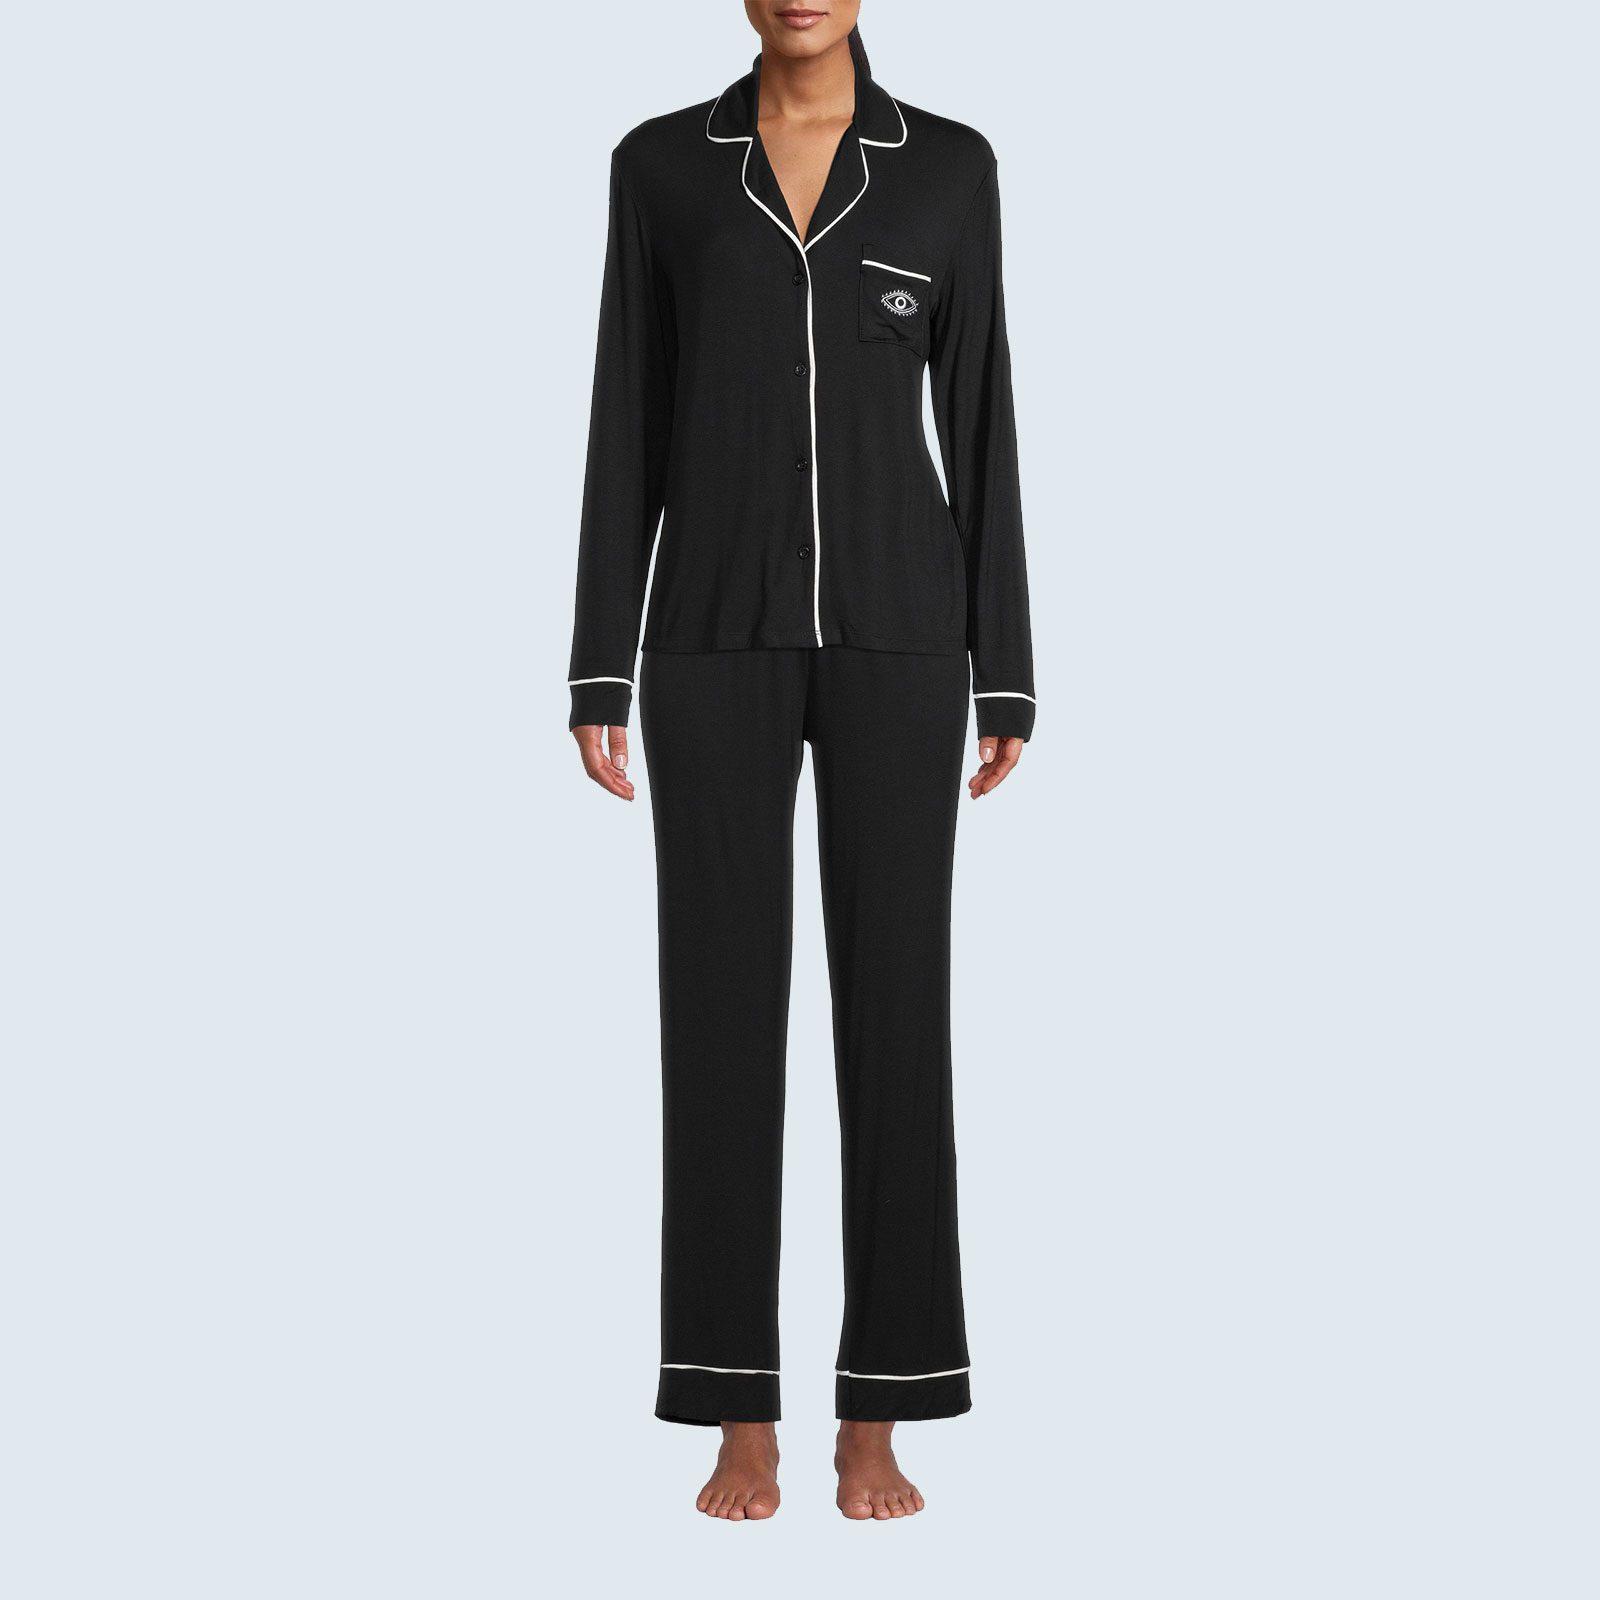 CafePress Celtic Dragonfly Pajamas Womens Novelty Cotton Pajama Set Comfortable PJ Sleepwear